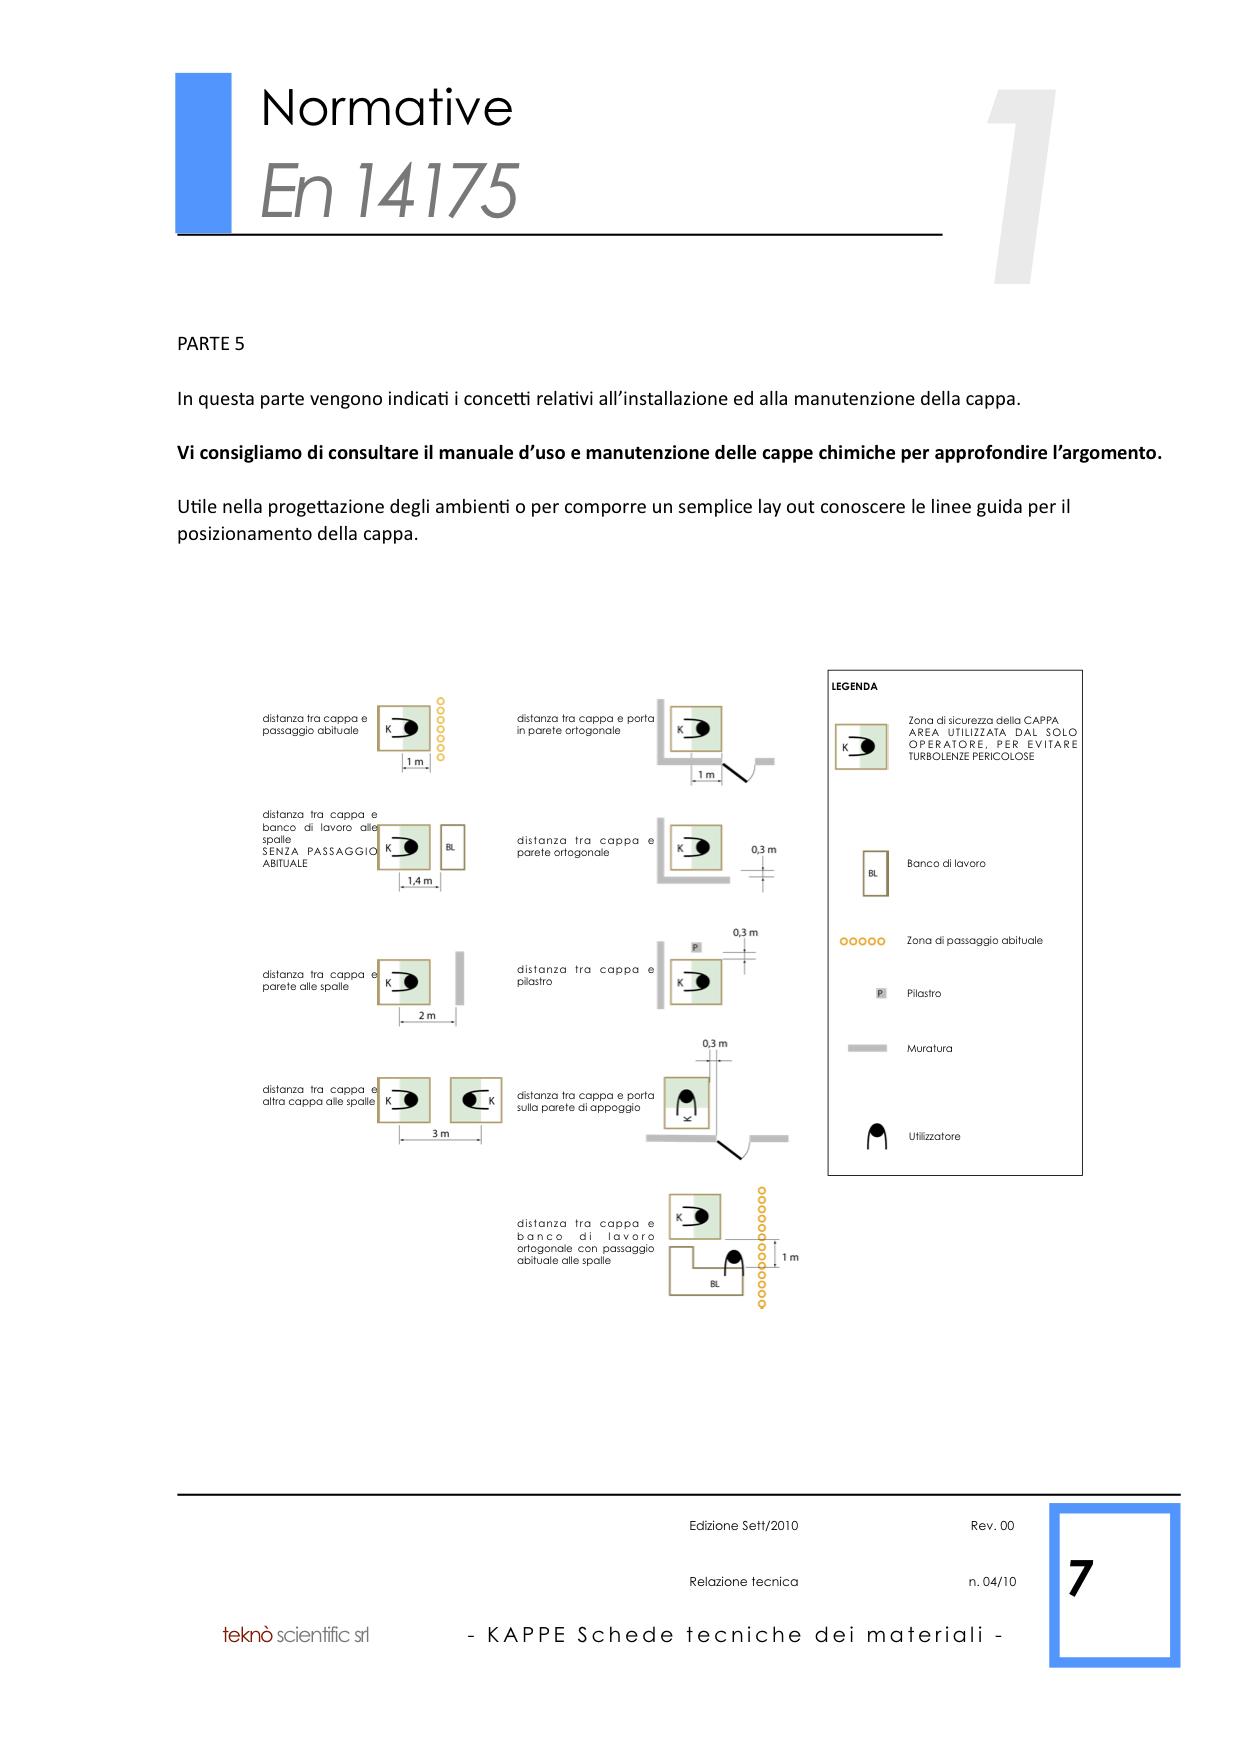 KAPPE Schede tecniche materiali copia 7.png